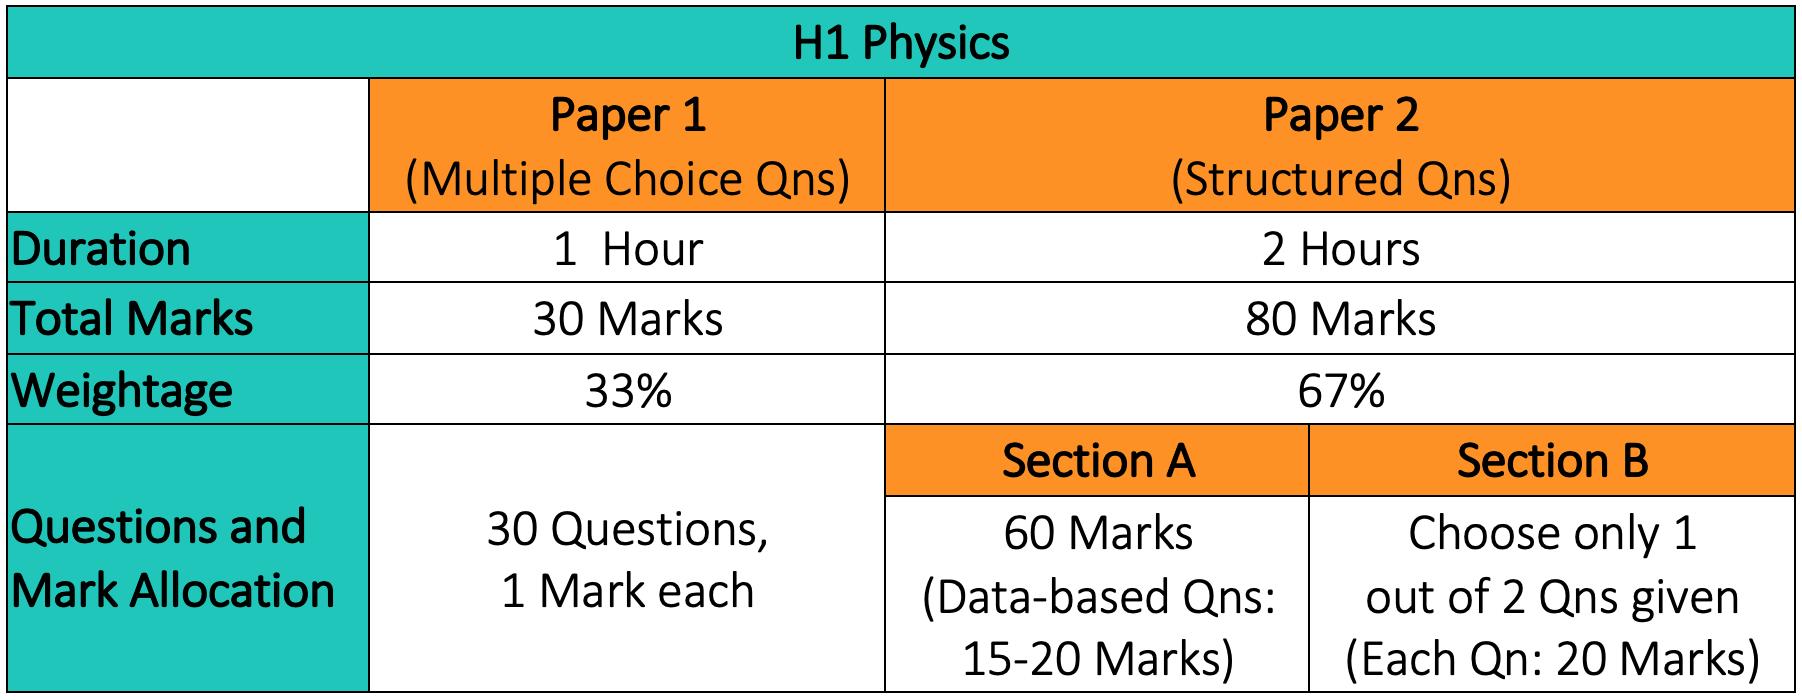 H1 Physics Examination Format